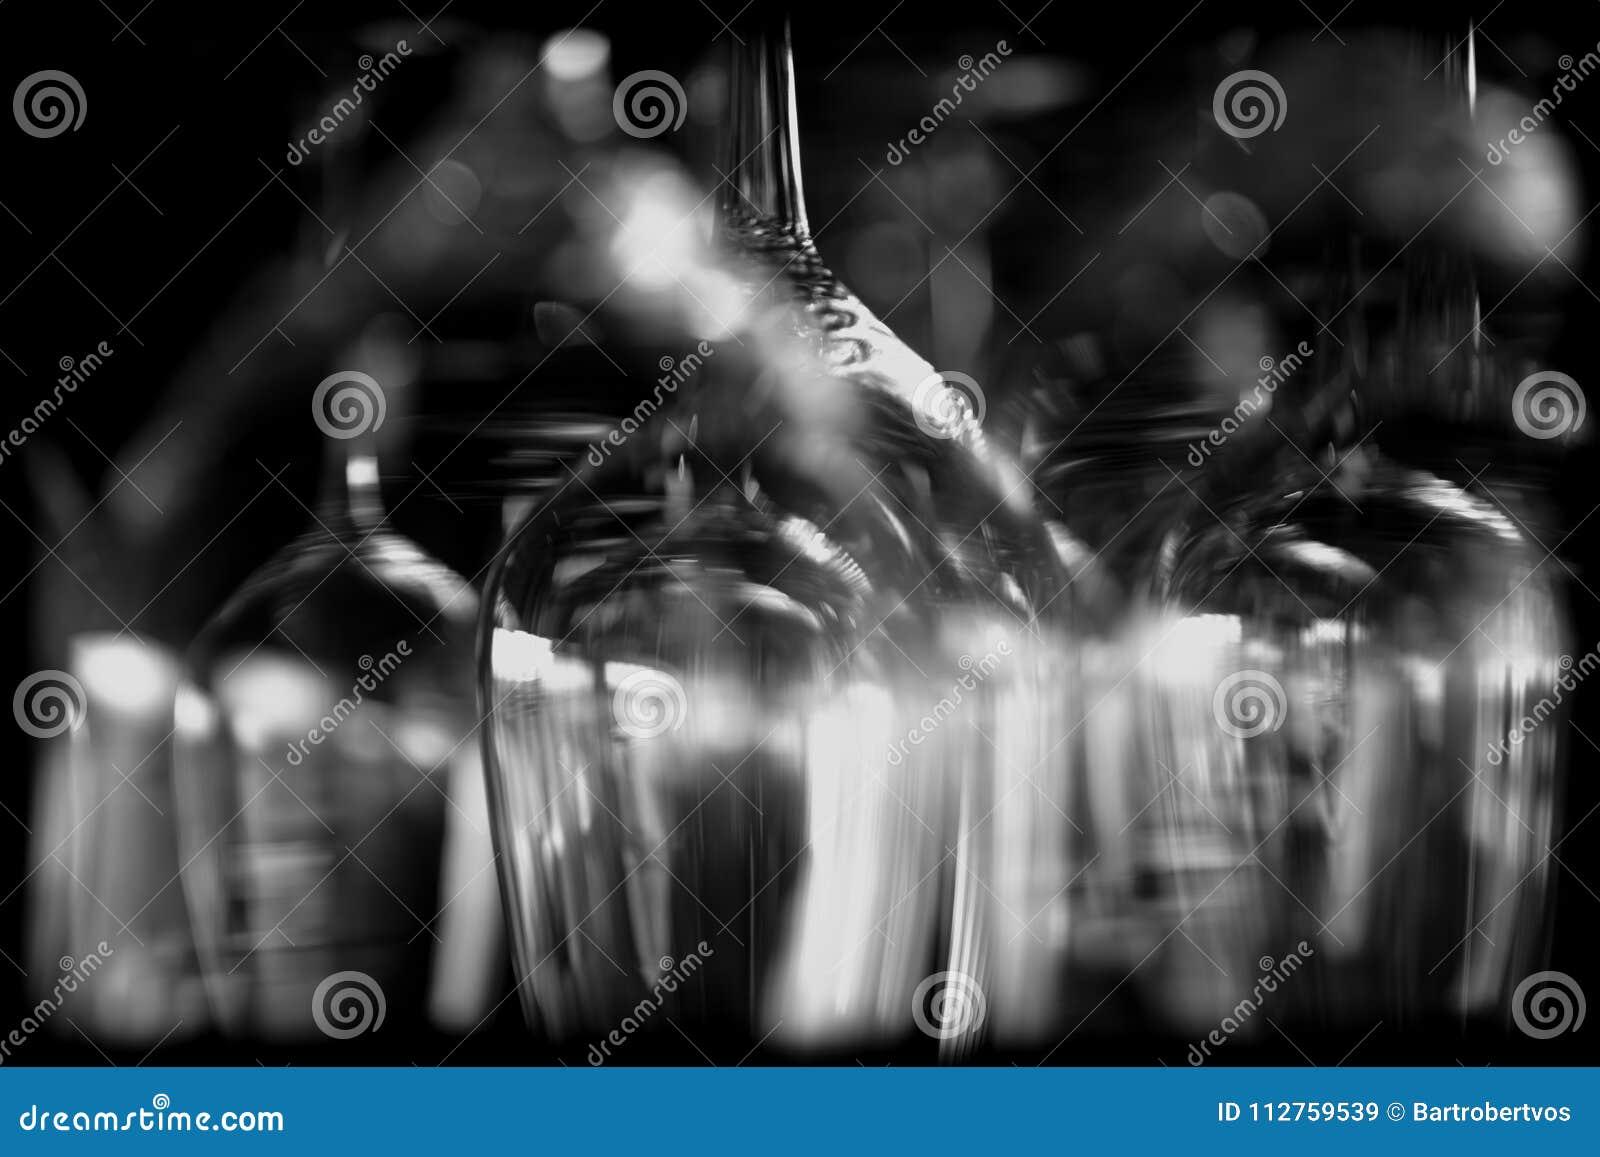 Abstrakte Weingläser